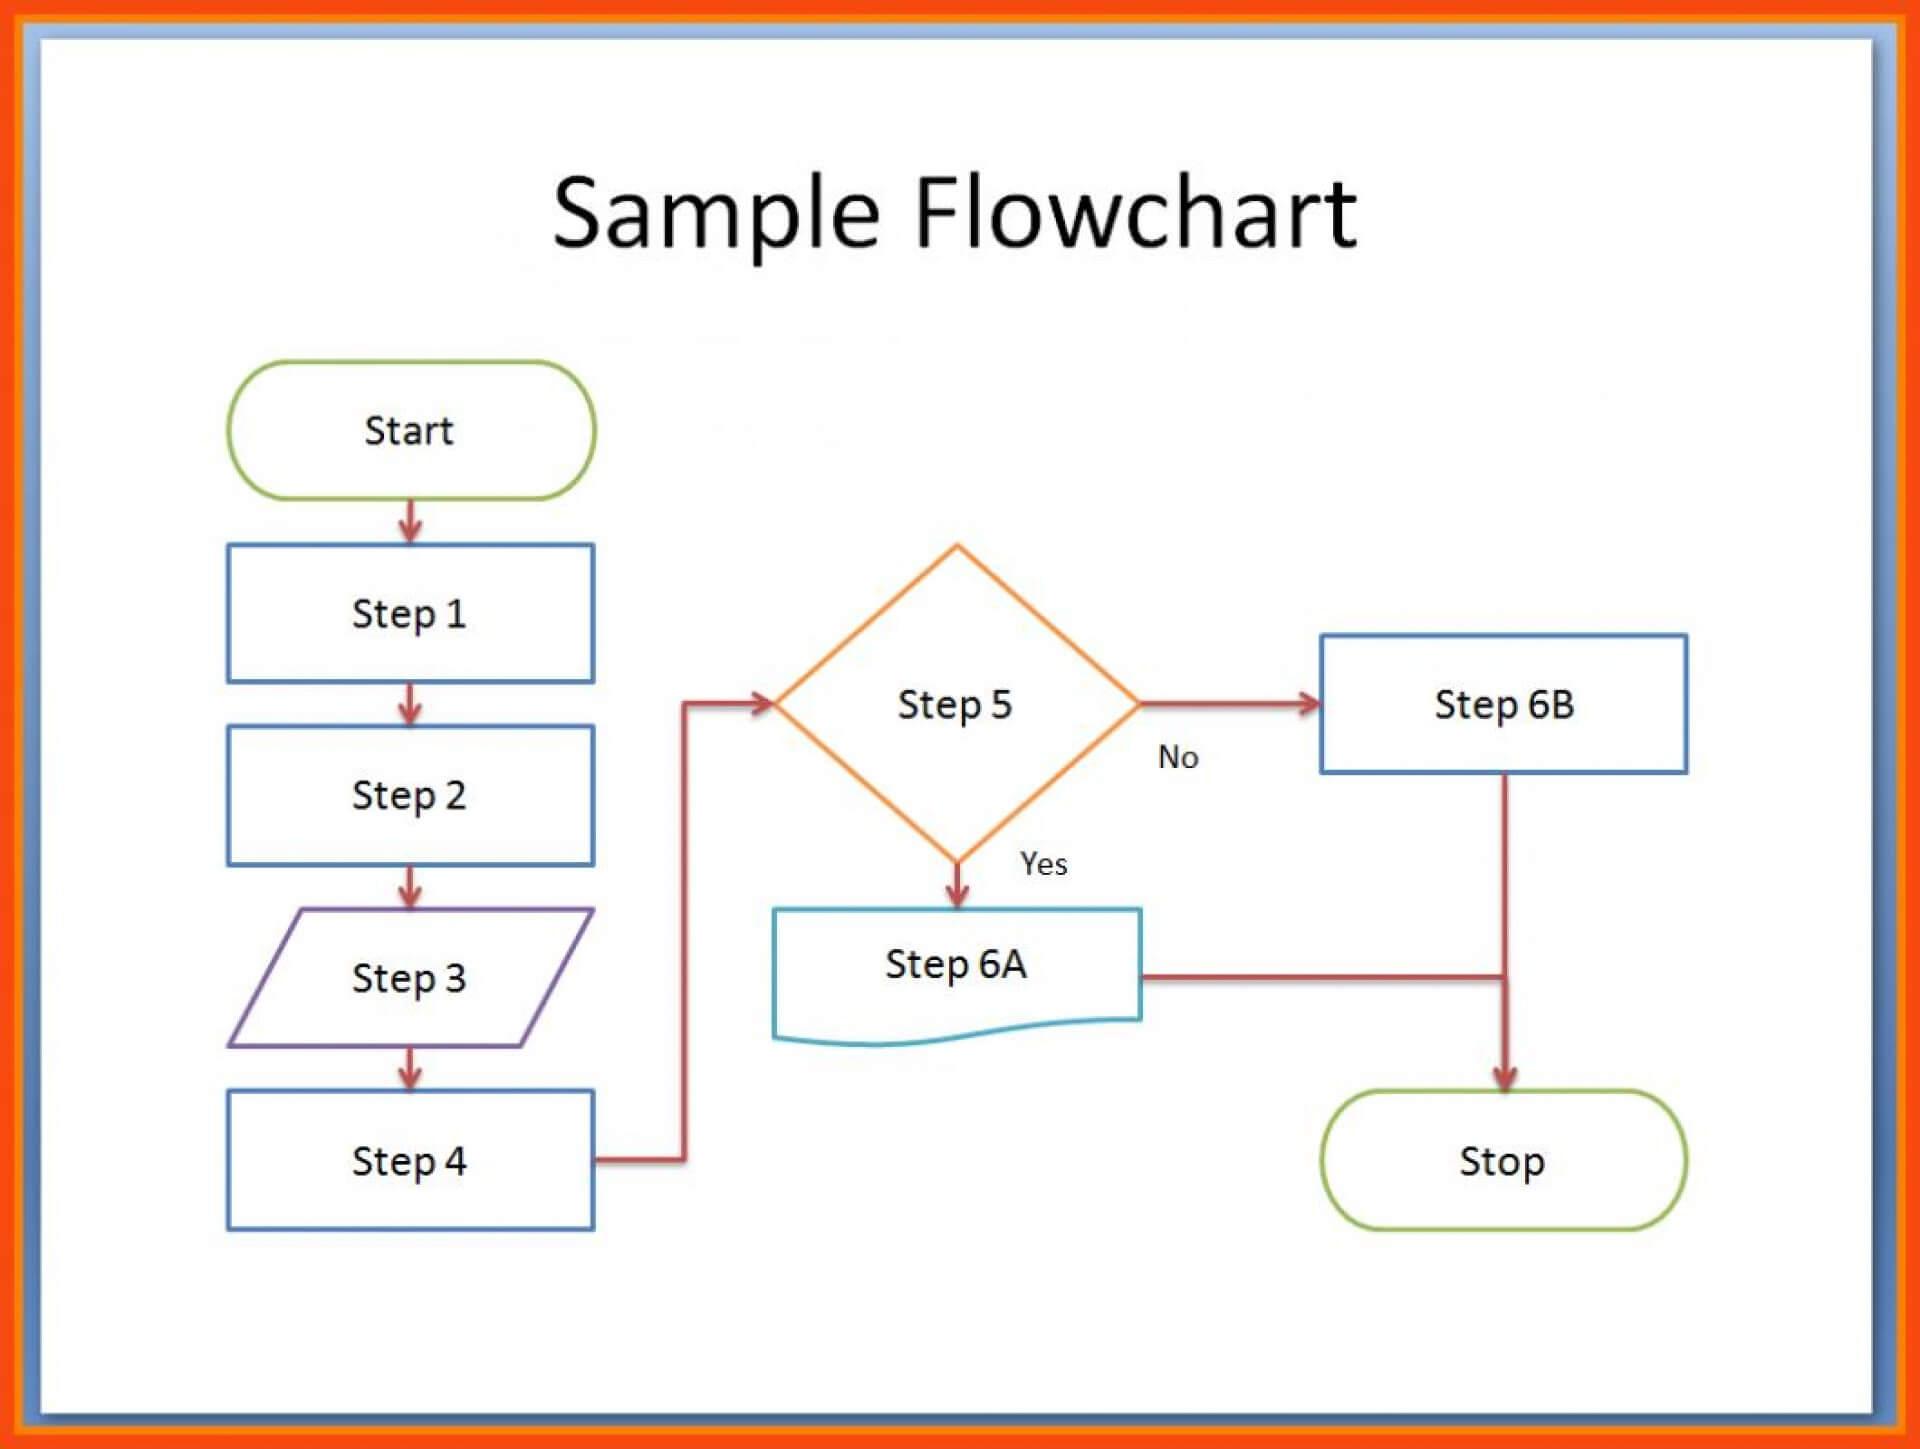 Flow Chart Template Word 2010 - Bobi.karikaturize With Regard To Microsoft Word Flowchart Template